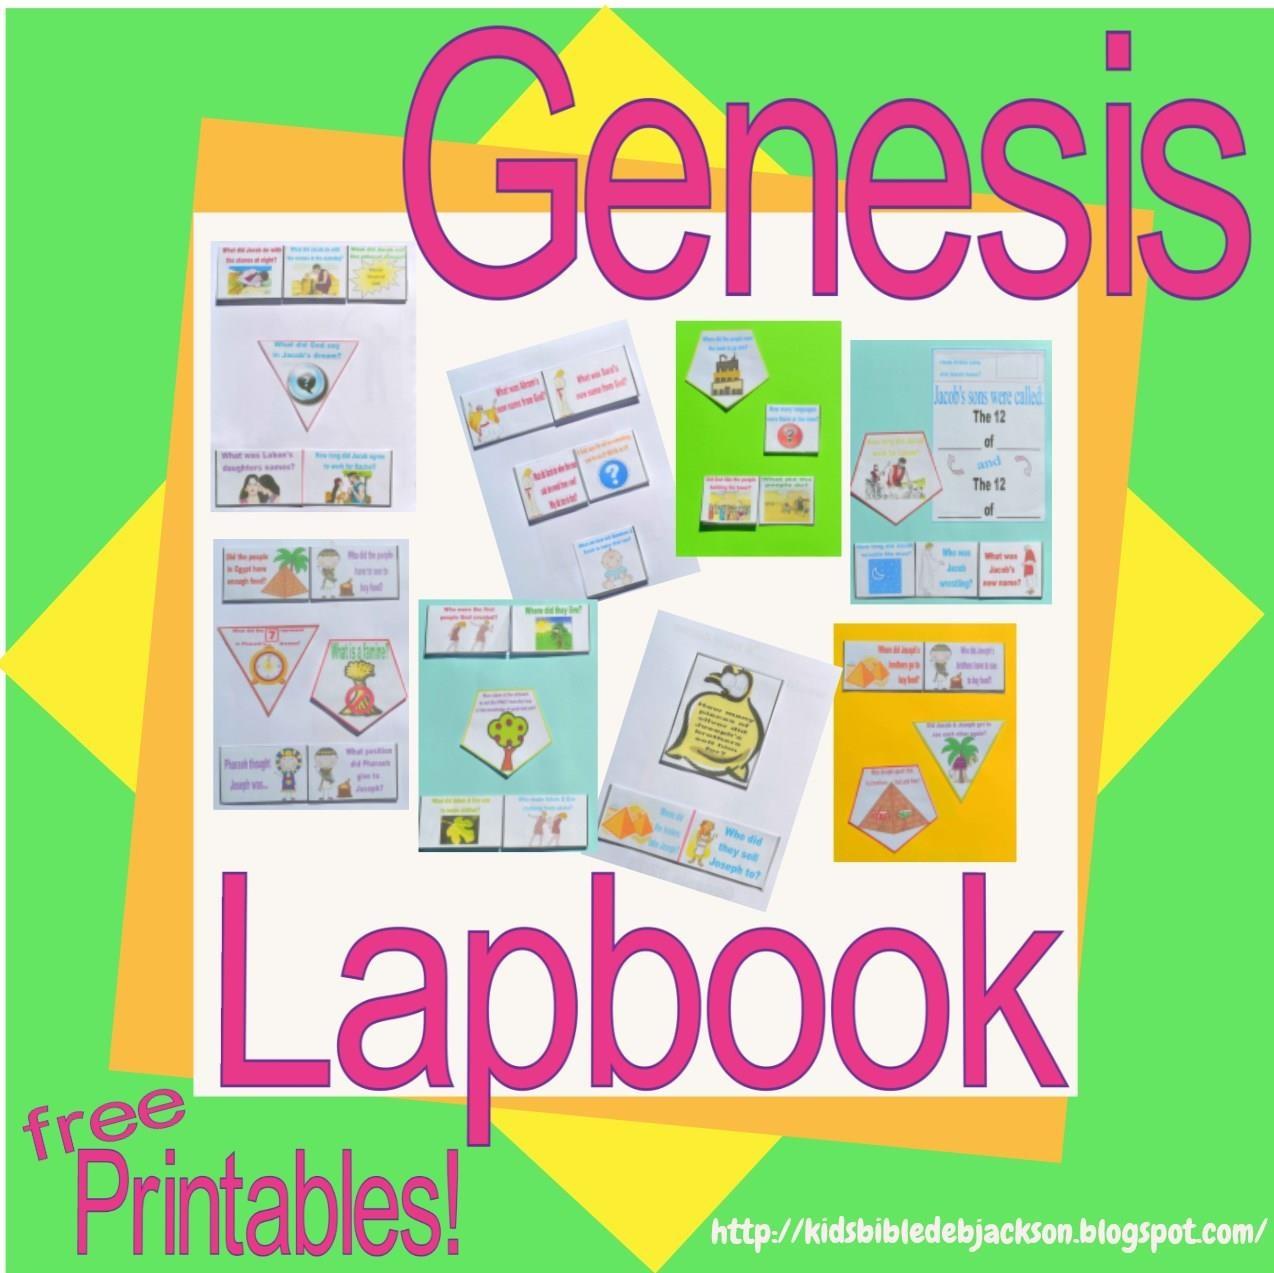 Bible Fun For Kids: Genesis Lapbook & Cut & Glue Student Worksheets - Free Printable Bible Study Lessons Genesis